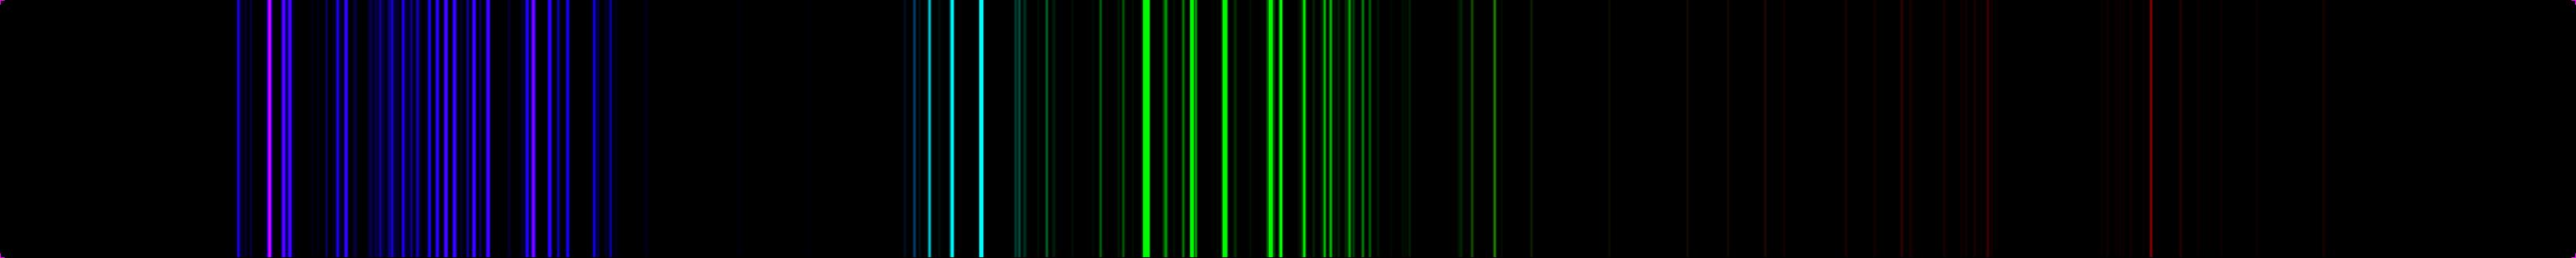 Iron 26 electrons atomic spectra pinterest gamestrikefo Images